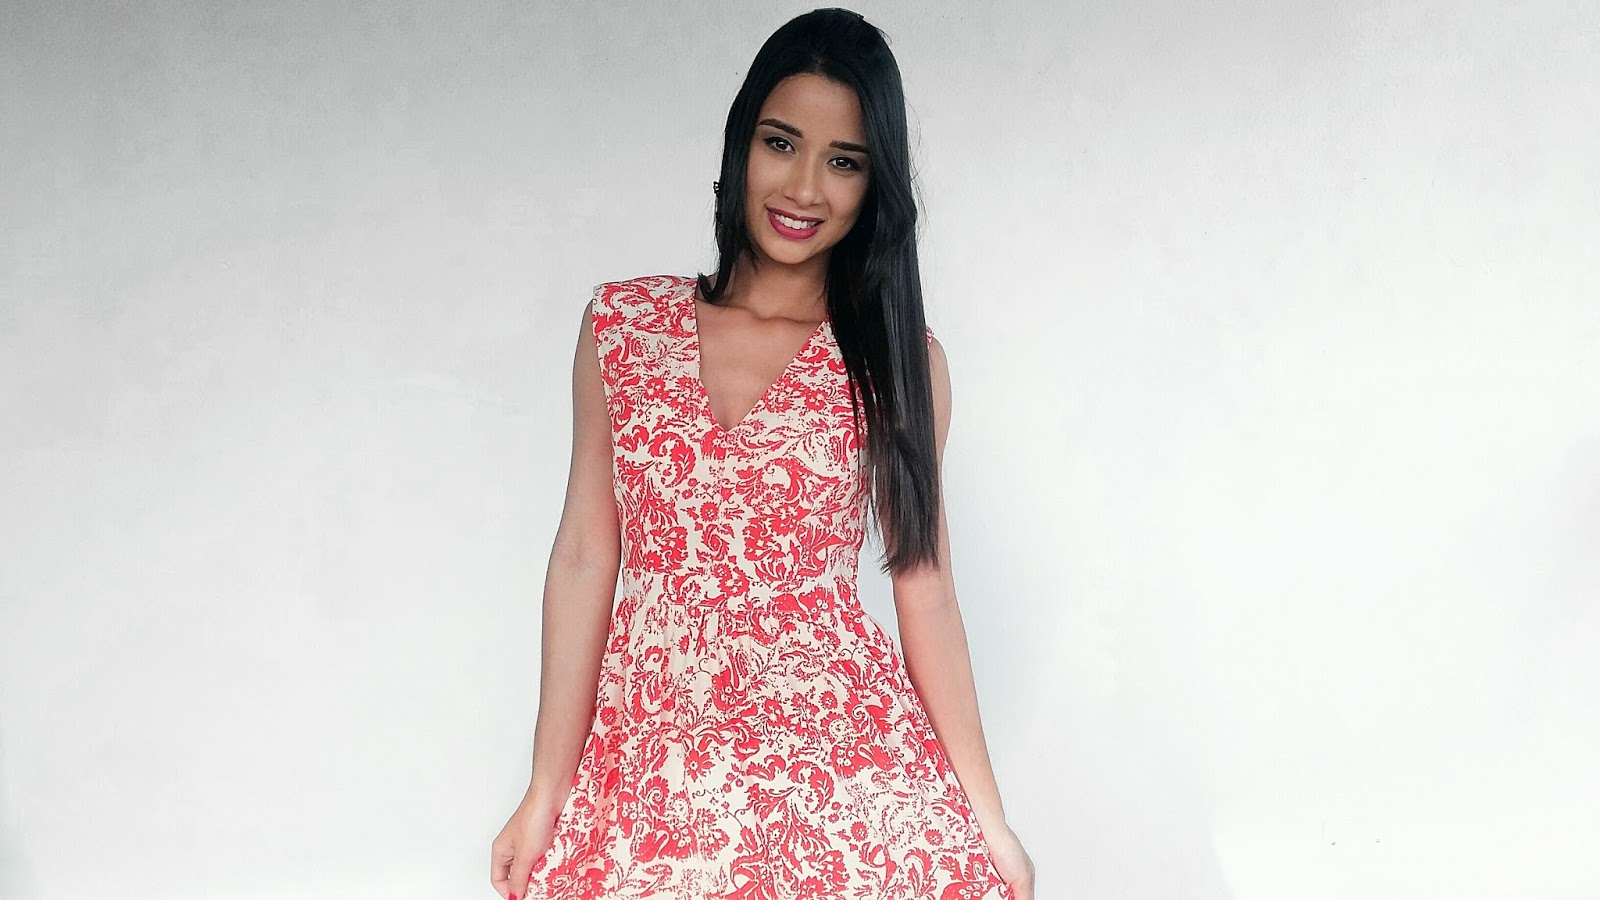 Look do Dia: Vestido Colorido